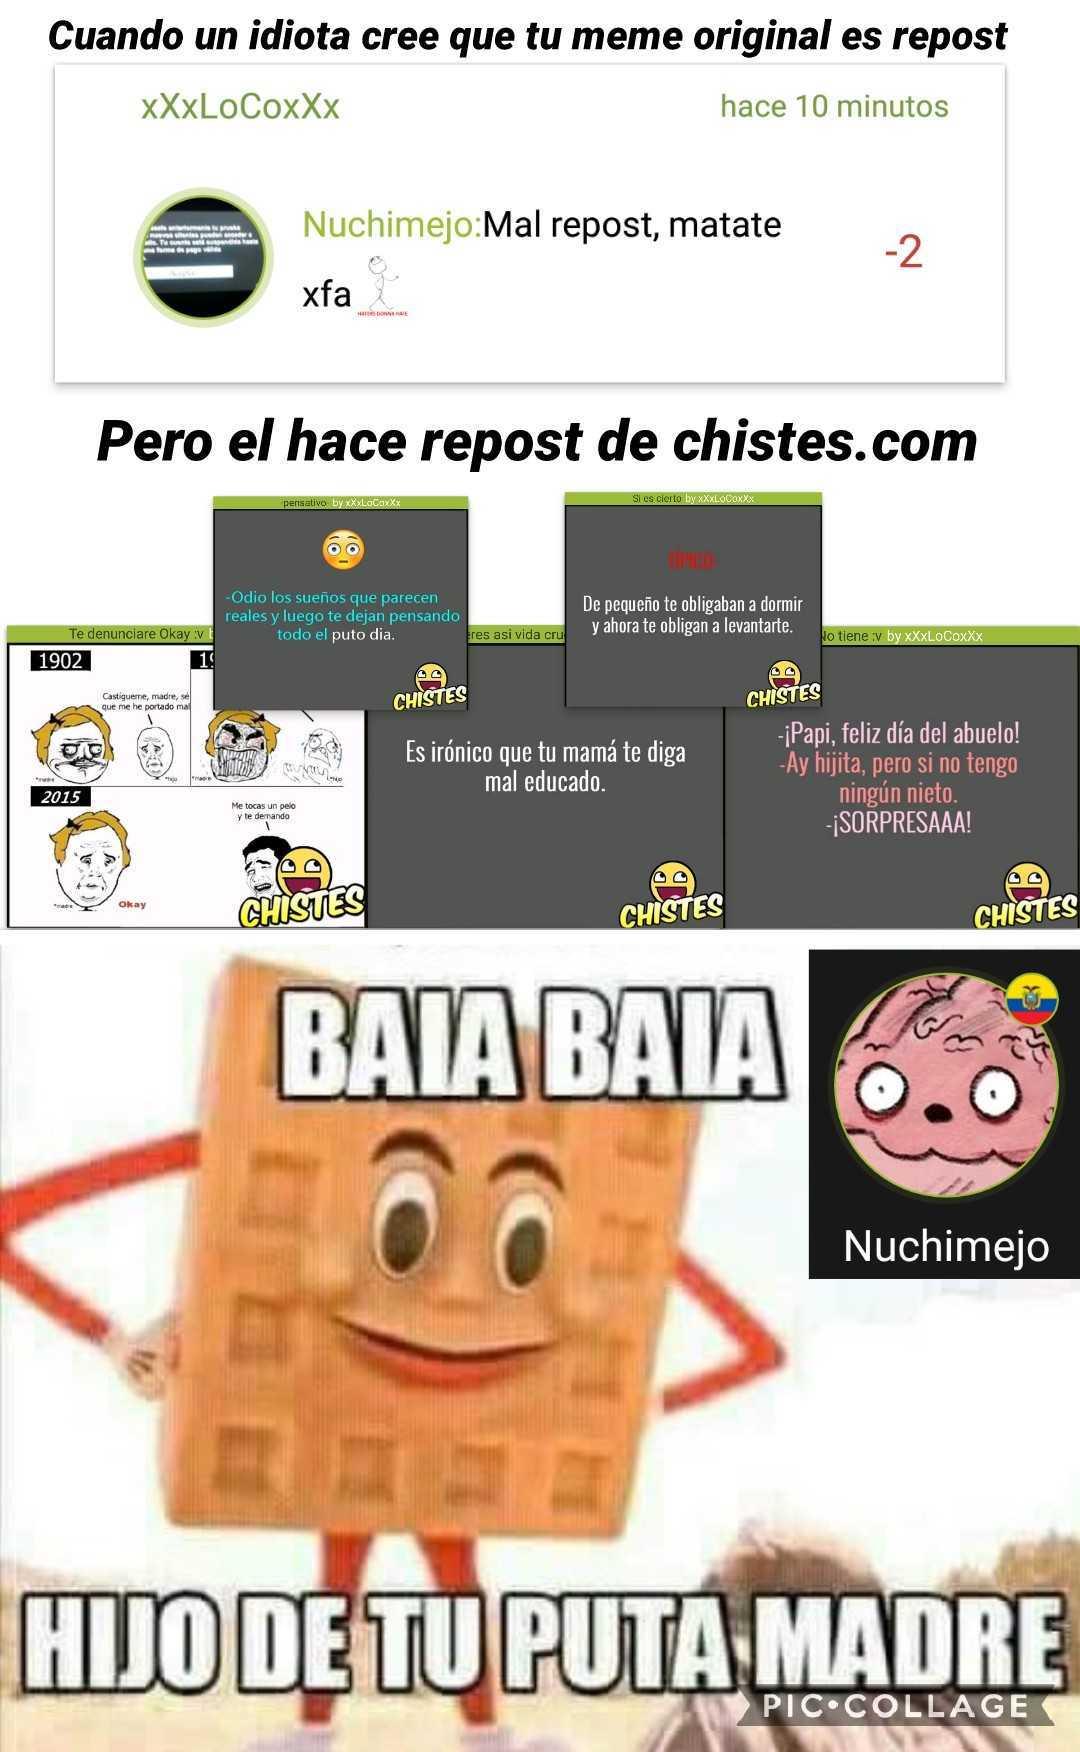 Haters gona hate - meme